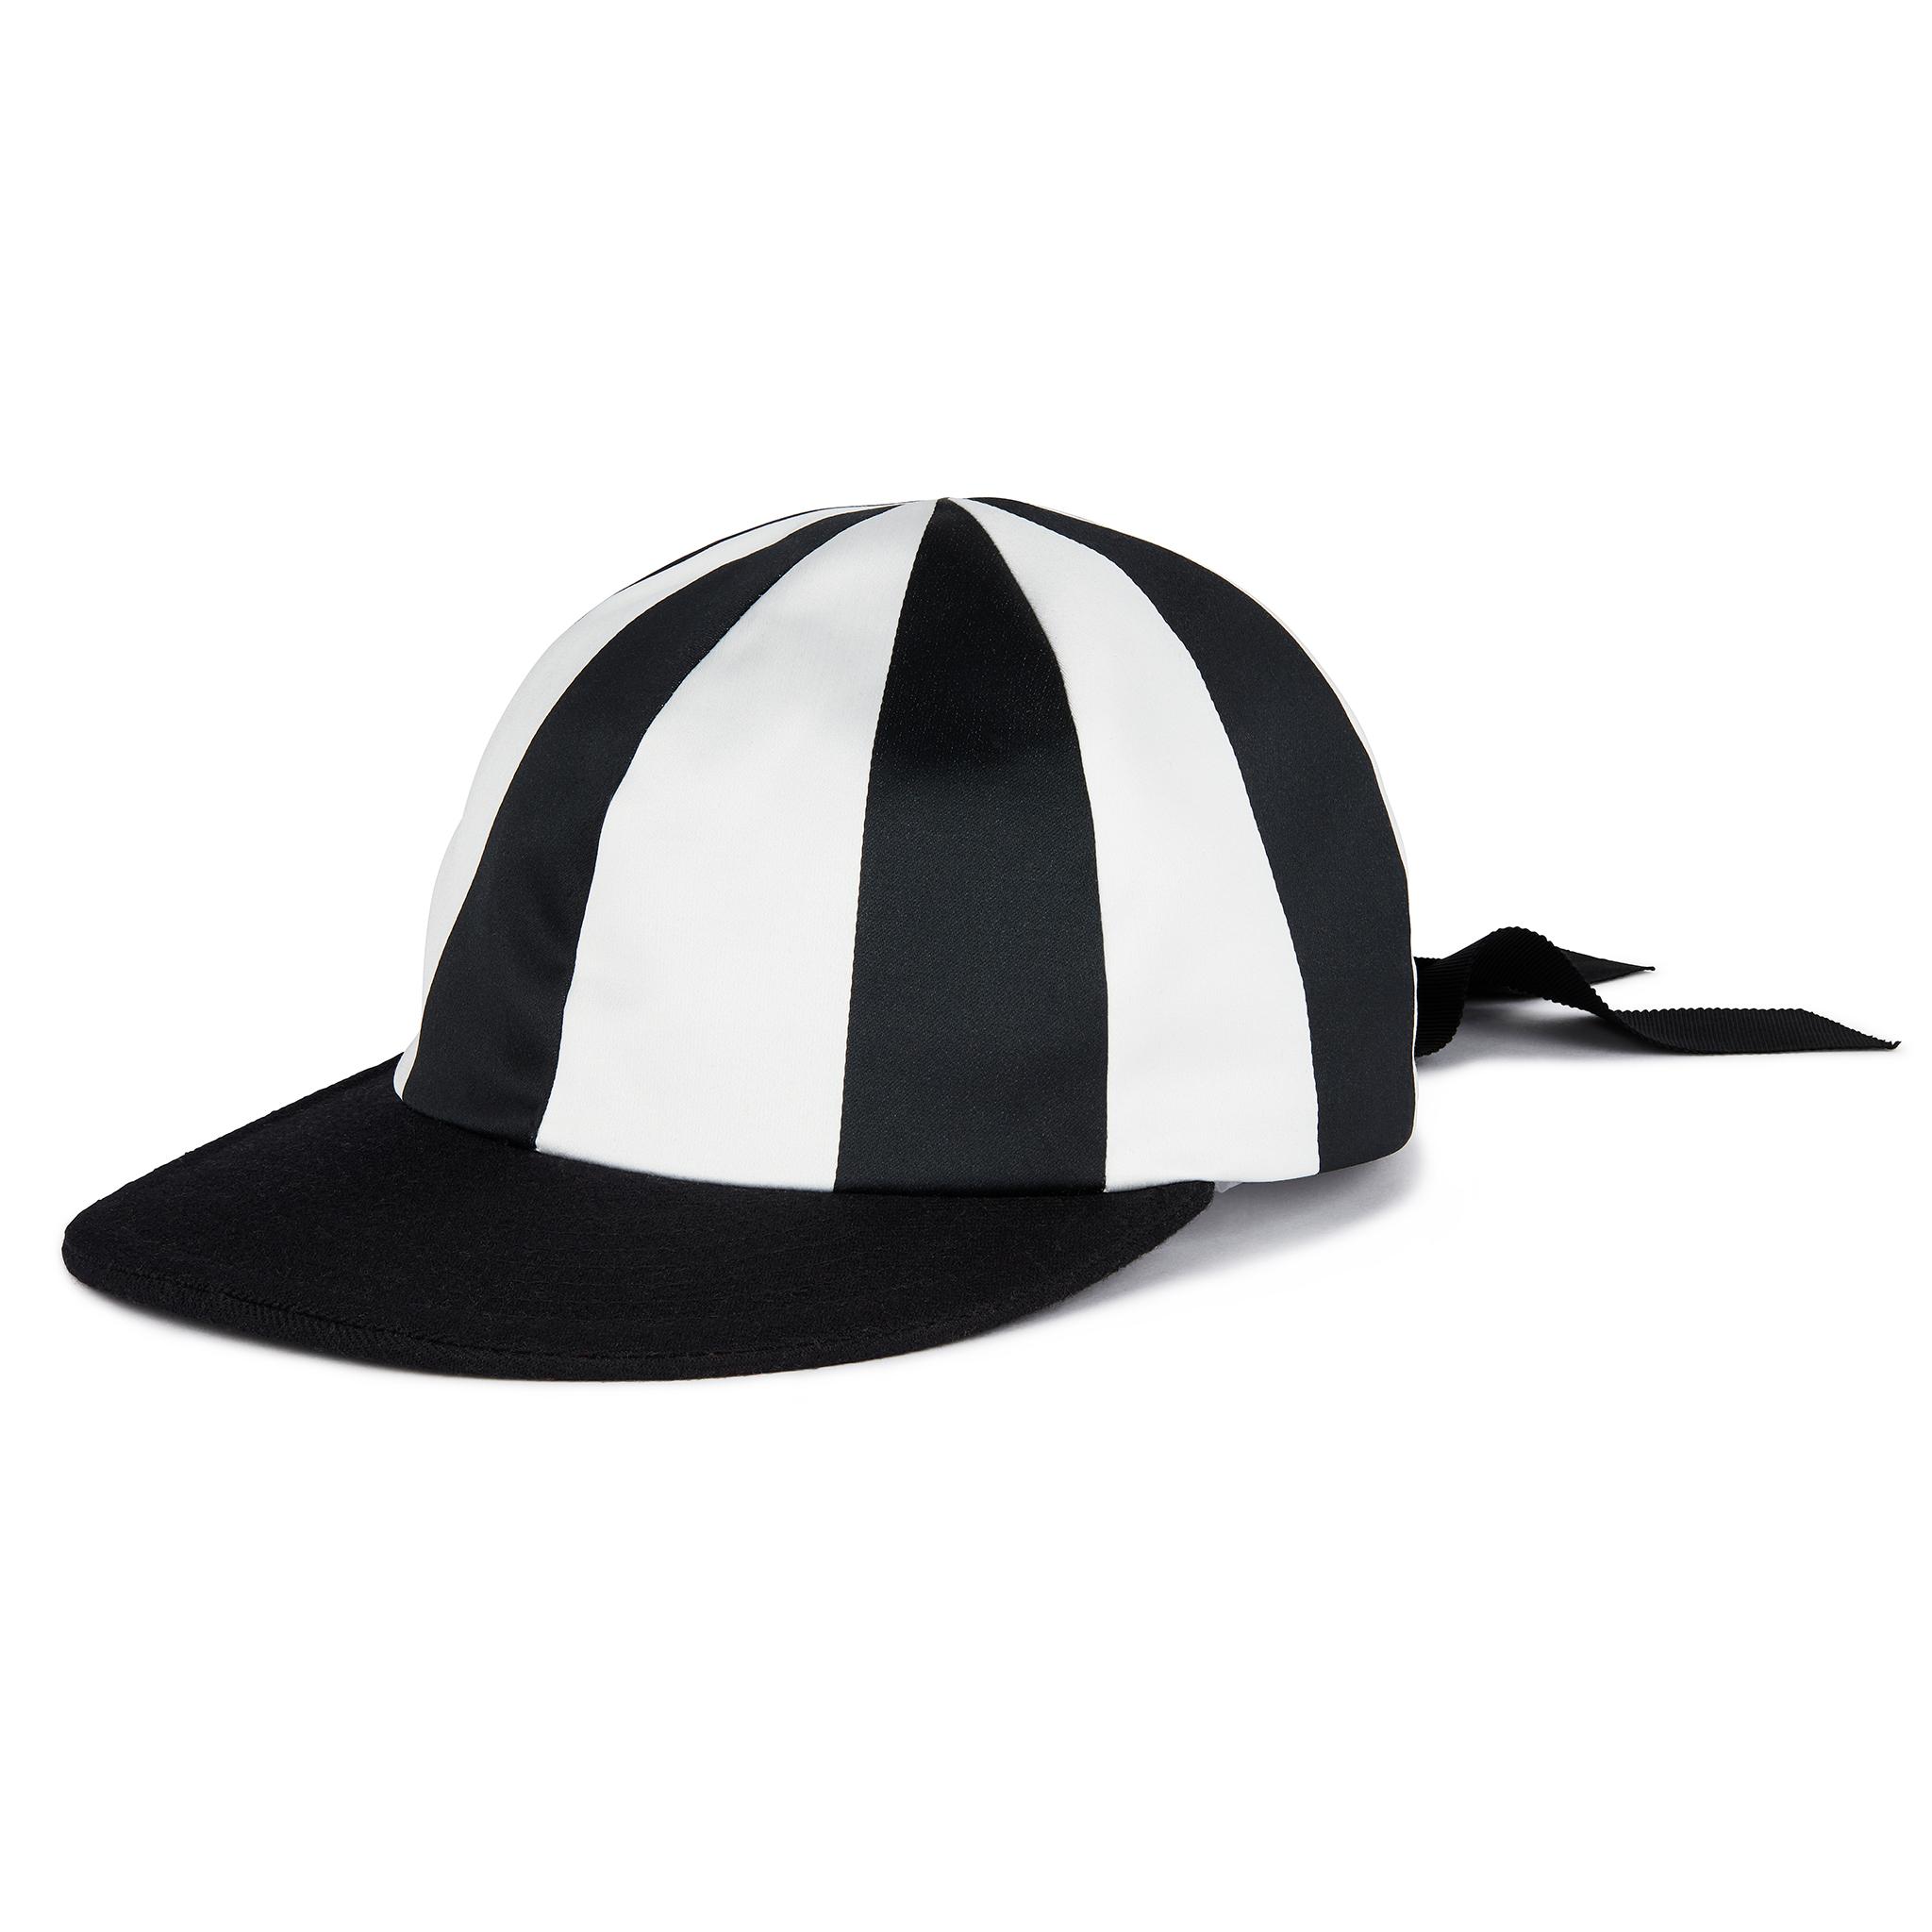 LRP-SM-Benoit-hats_07.jpg